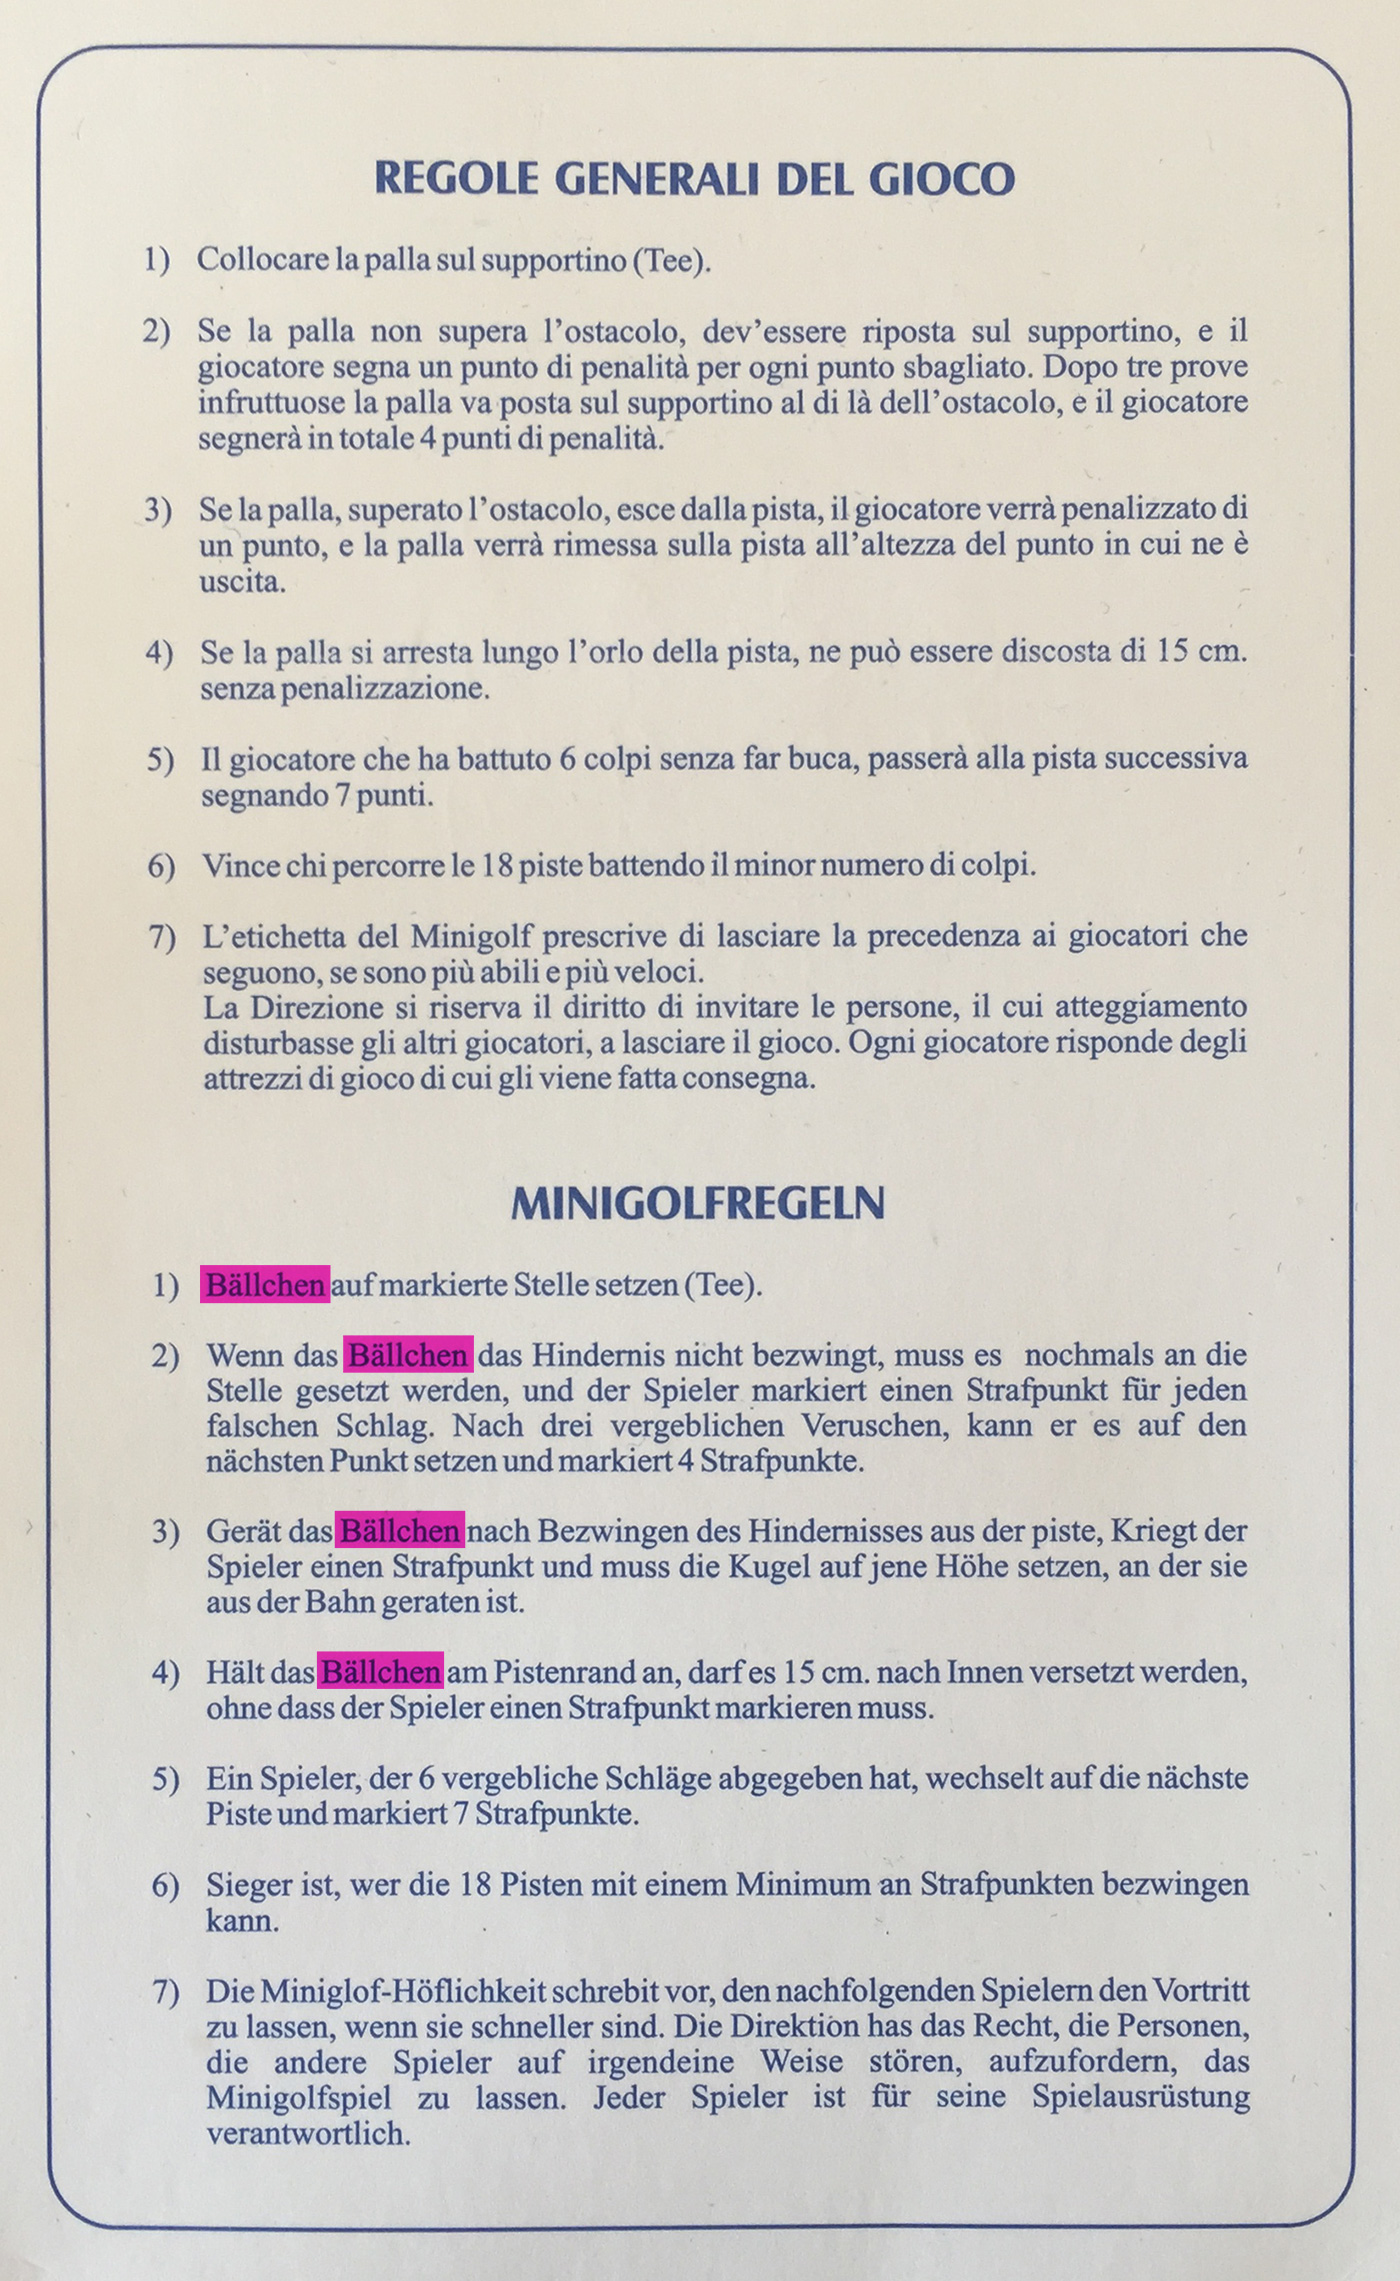 Minigolfregeln aus Italien Minigolf Regeln